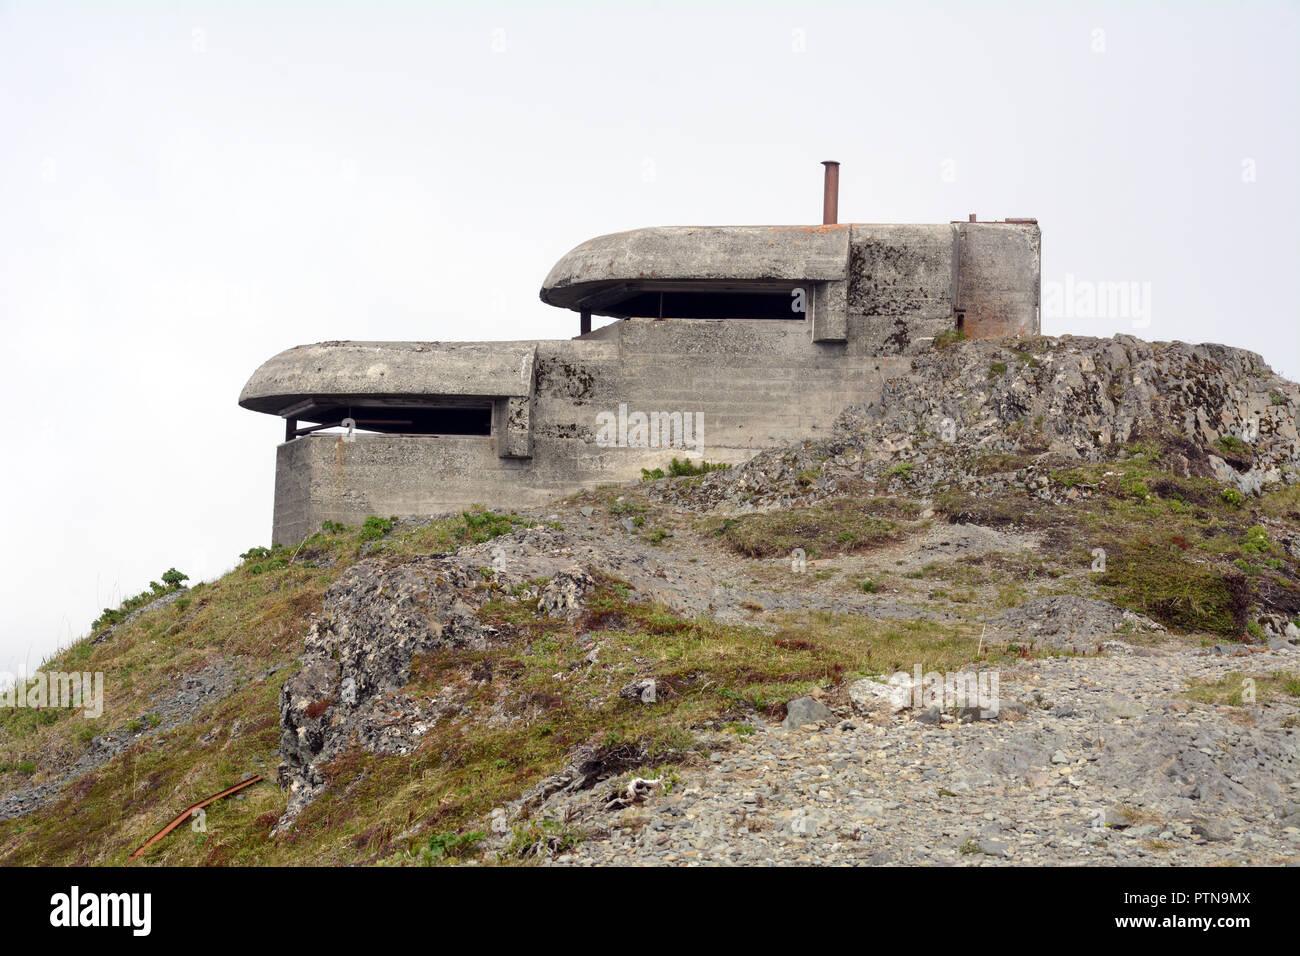 An abandoned World War Two U.S. military bunker and observation point on Bunker Hill, over Dutch Harbor, Unalaska, Aleutian Islands, Alaska, USA. - Stock Image